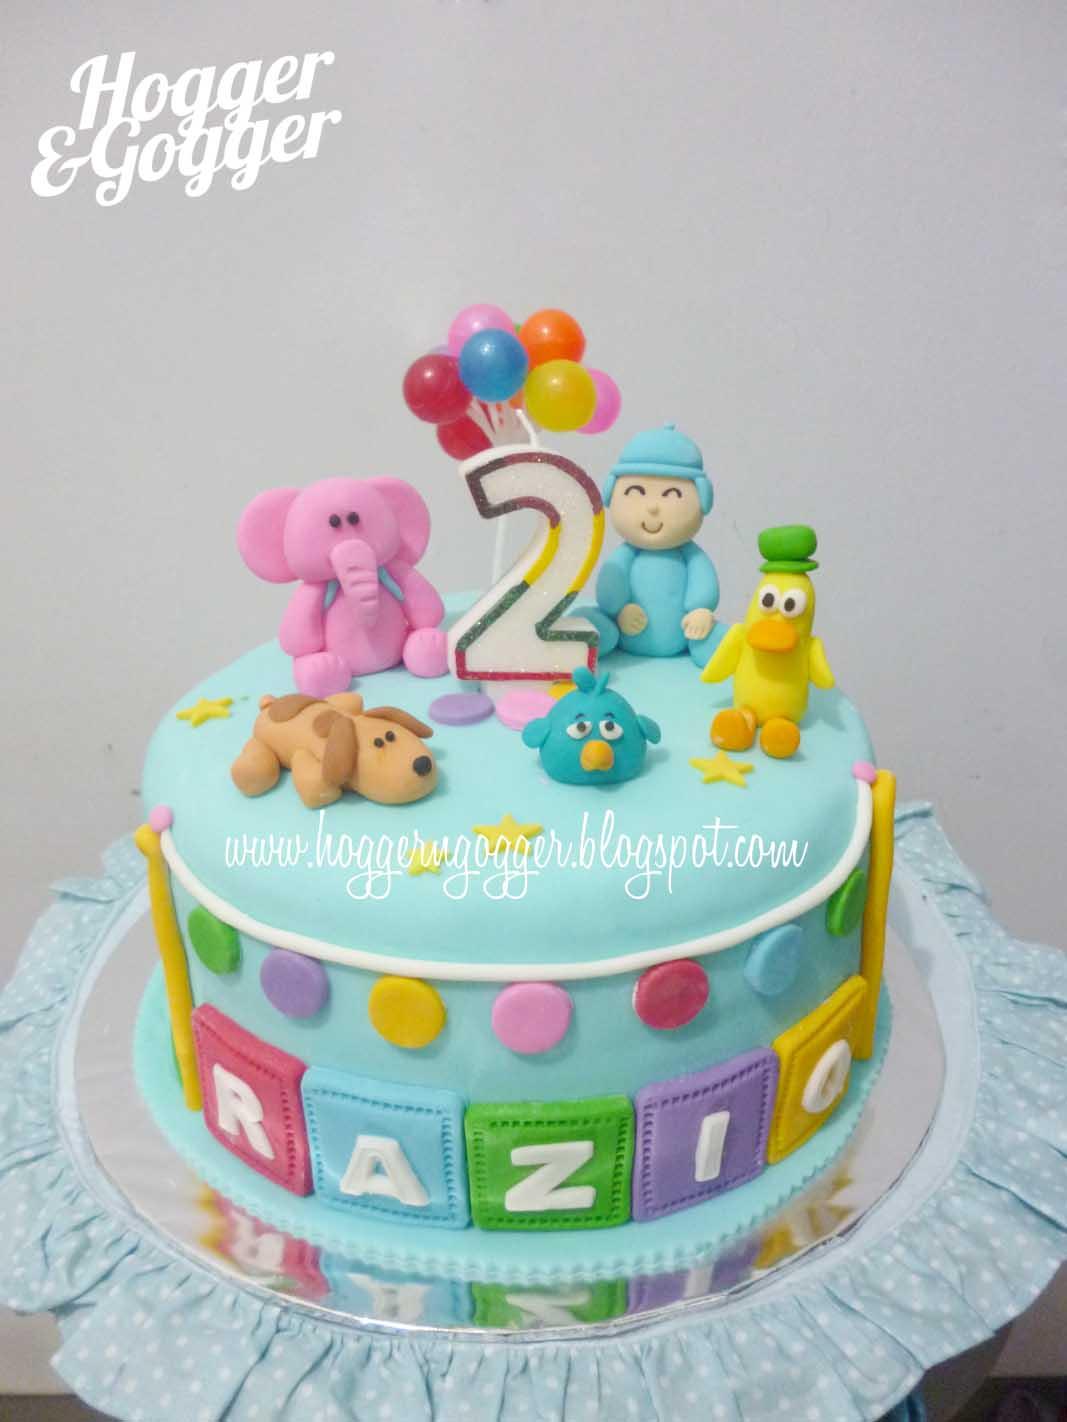 Hoggergogger Pocoyo Birthday Cake